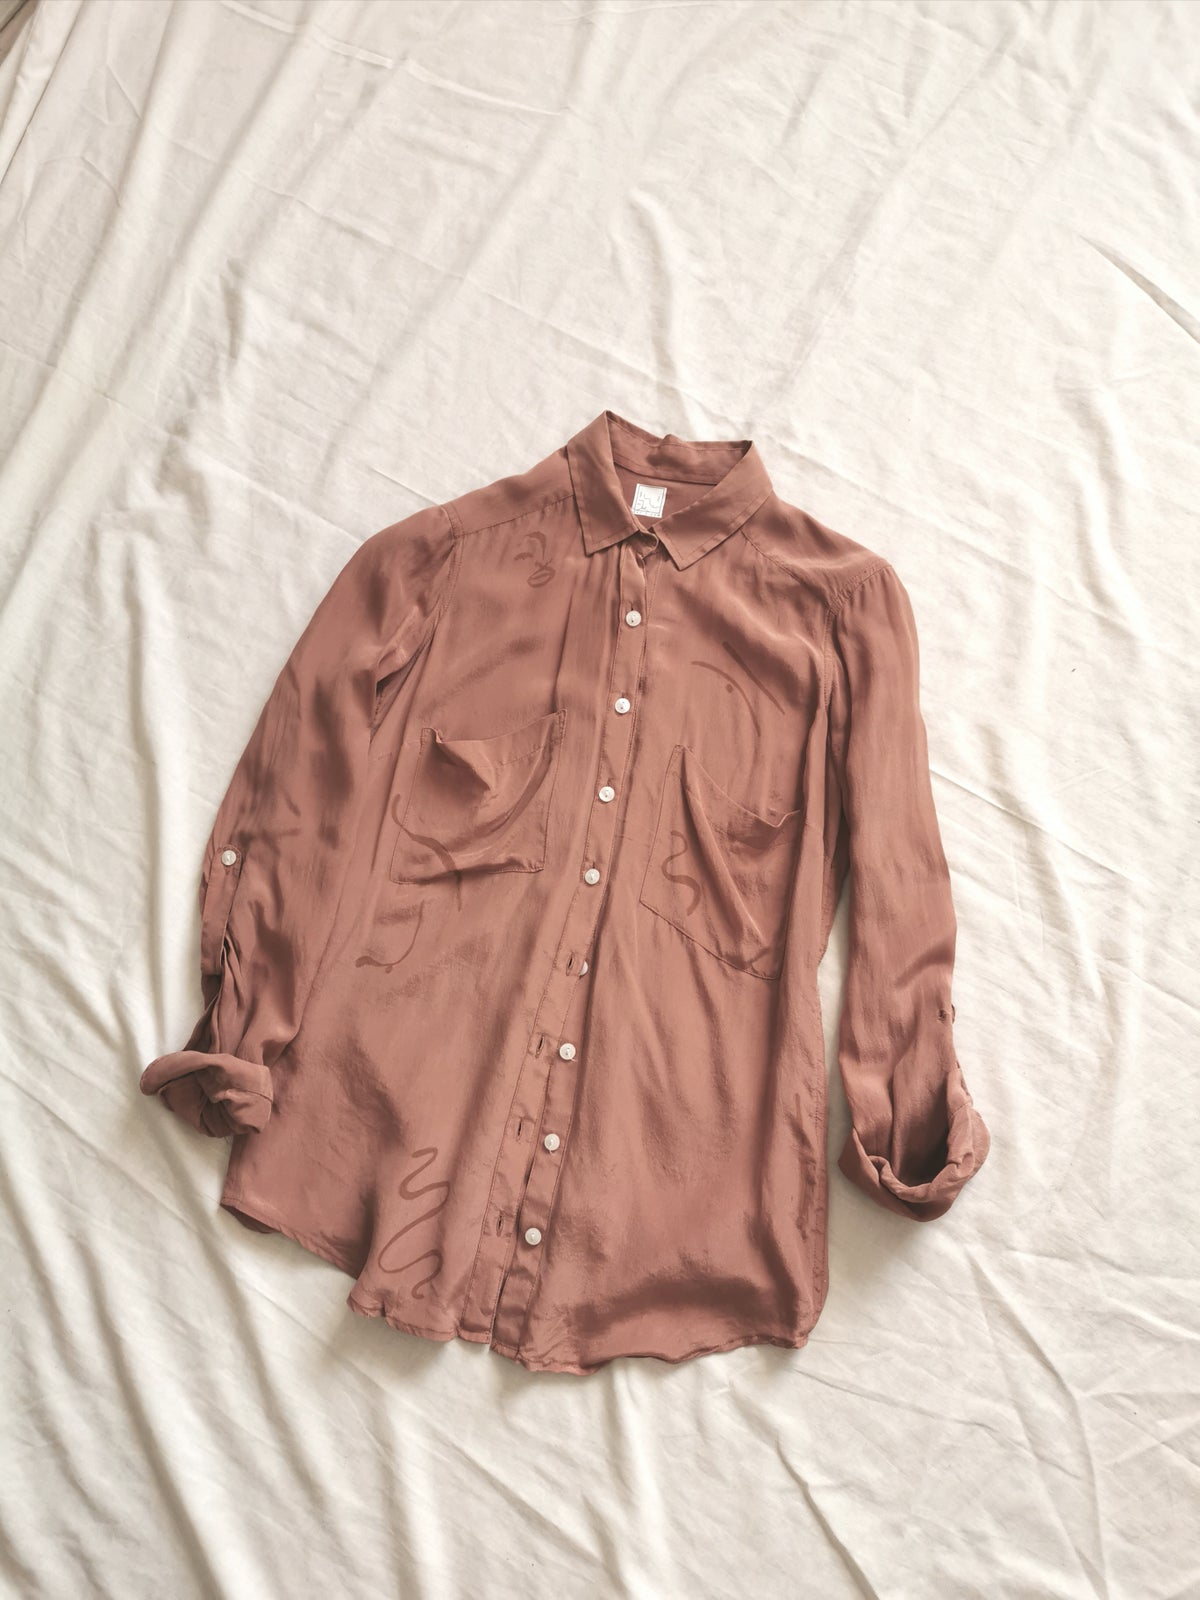 Image of papaya rust blouse